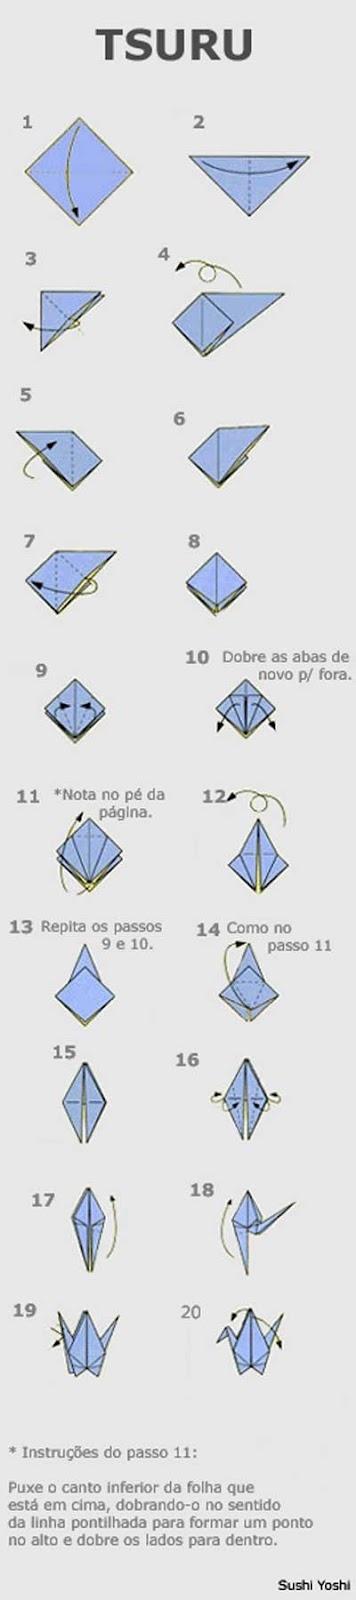 Love doing origamis